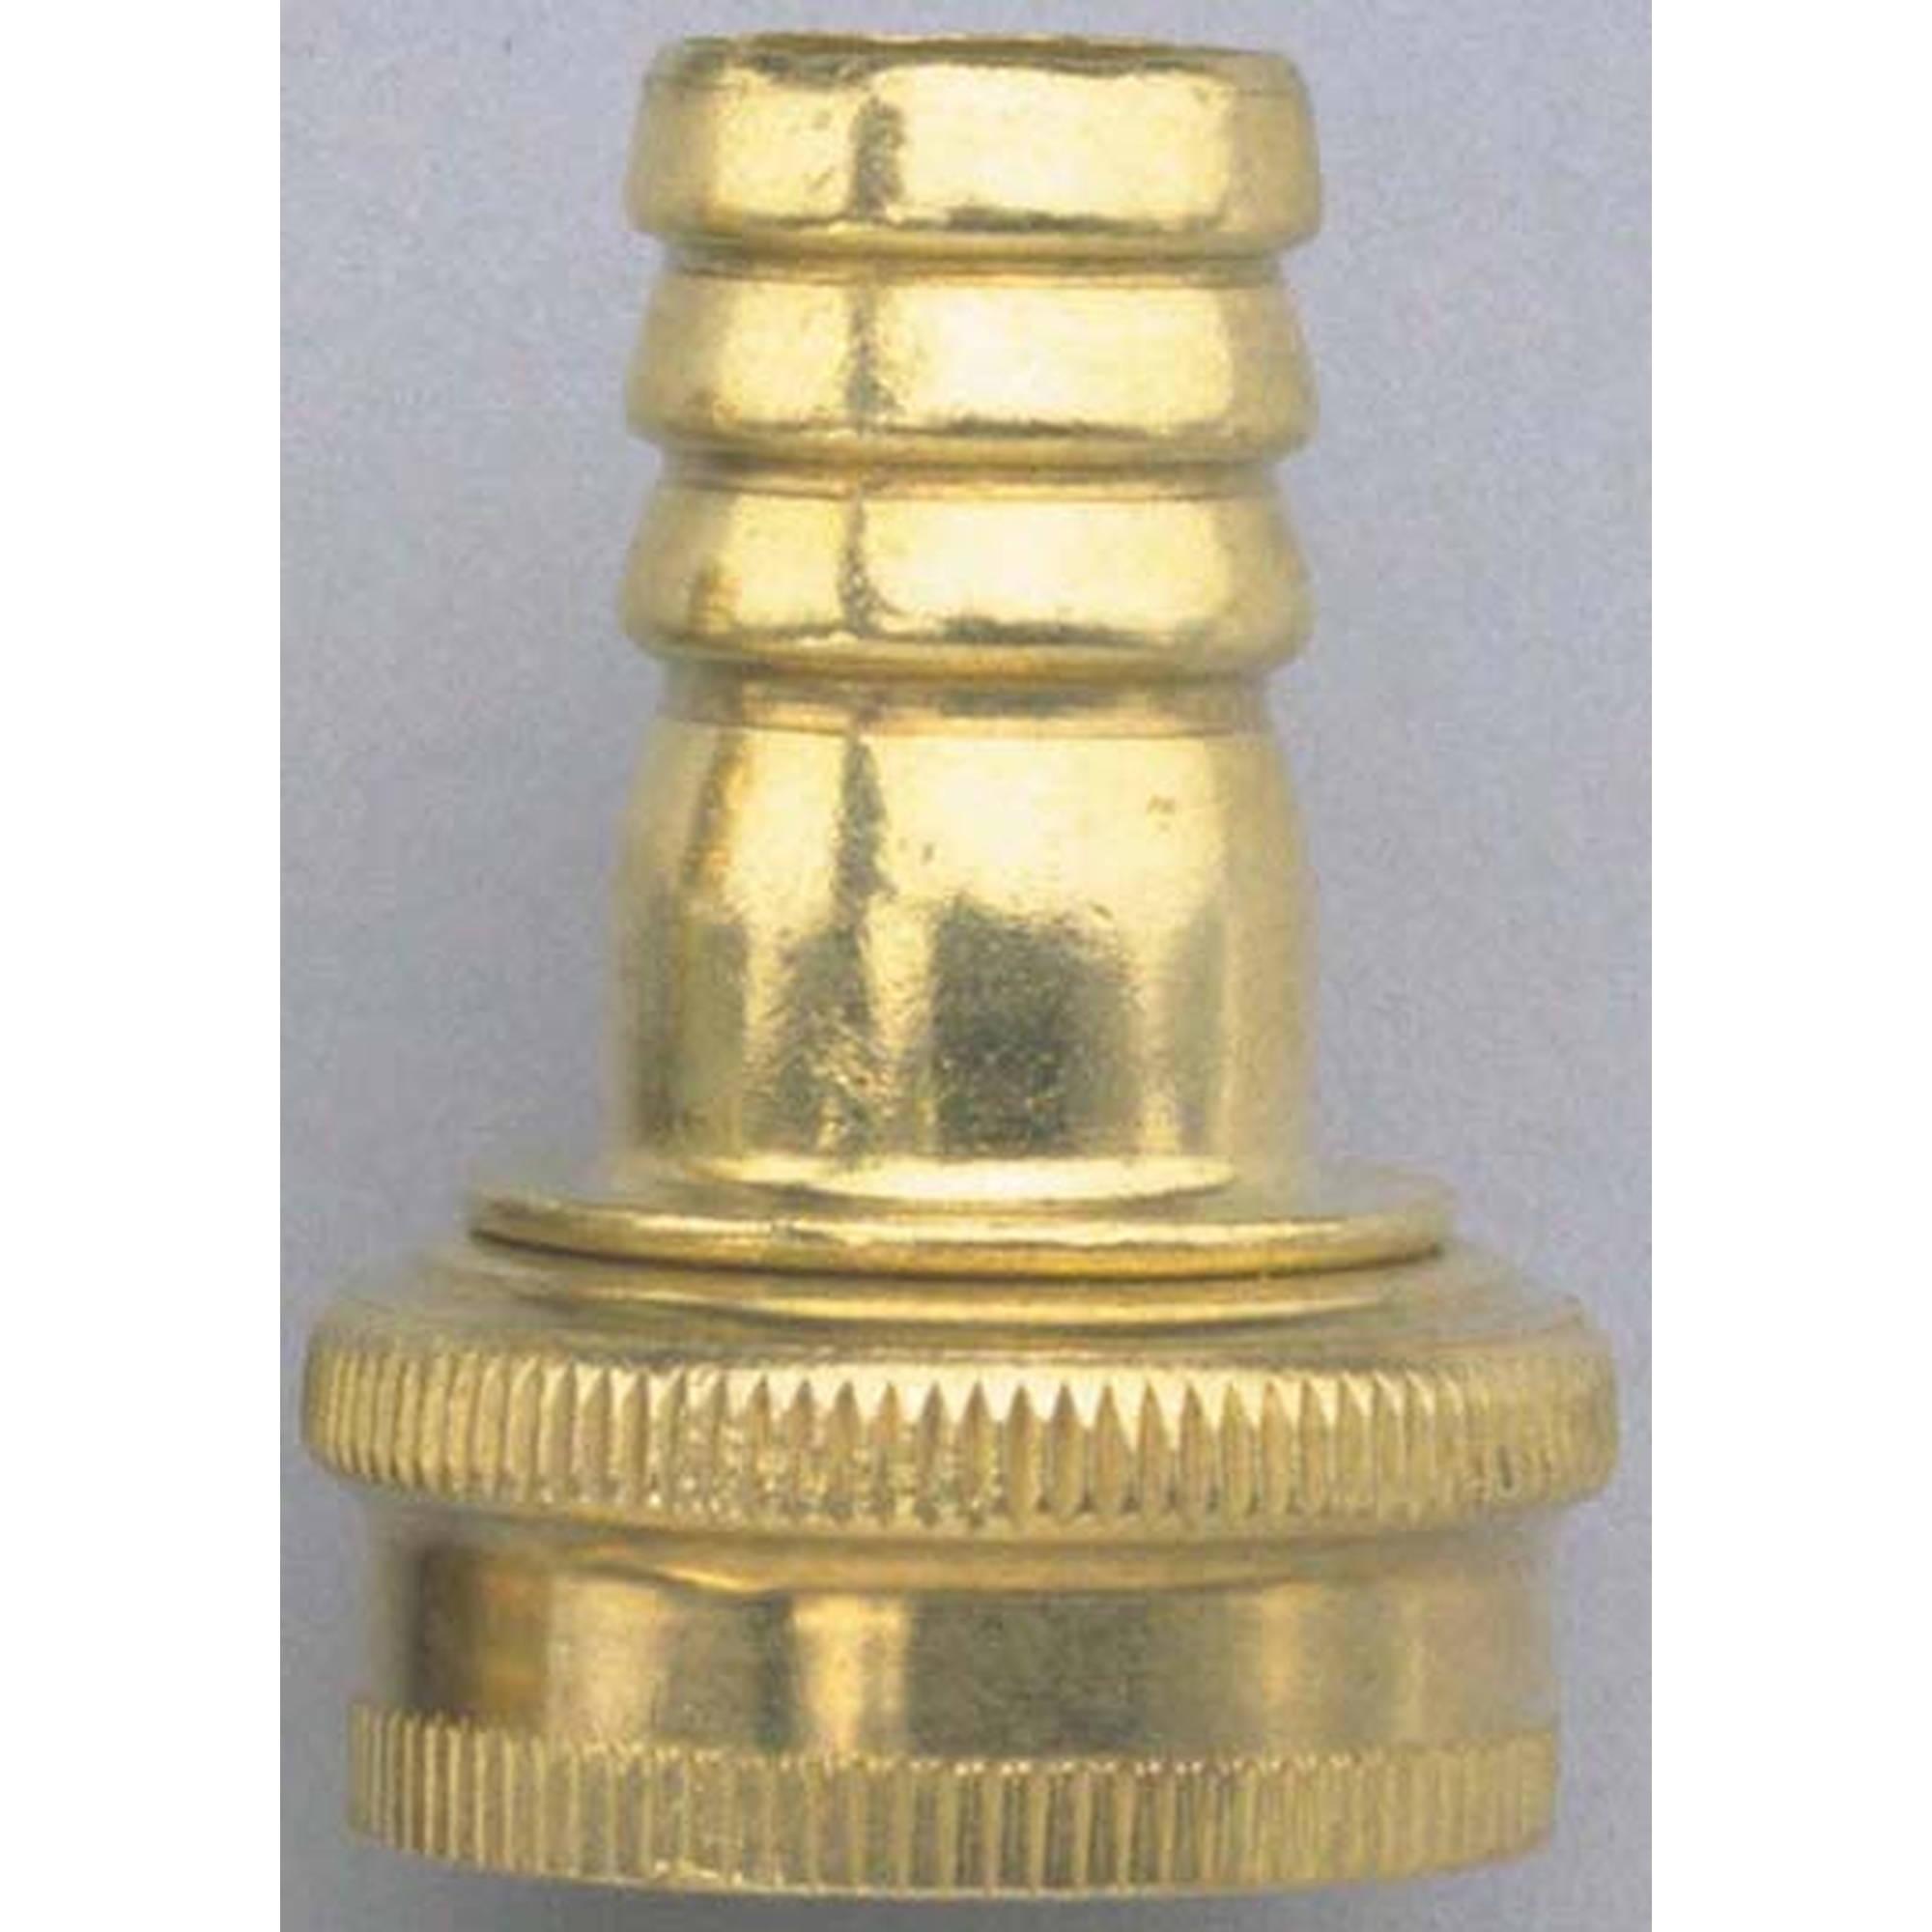 Orbit 58136N Female Brass Shank Menders with Clamps